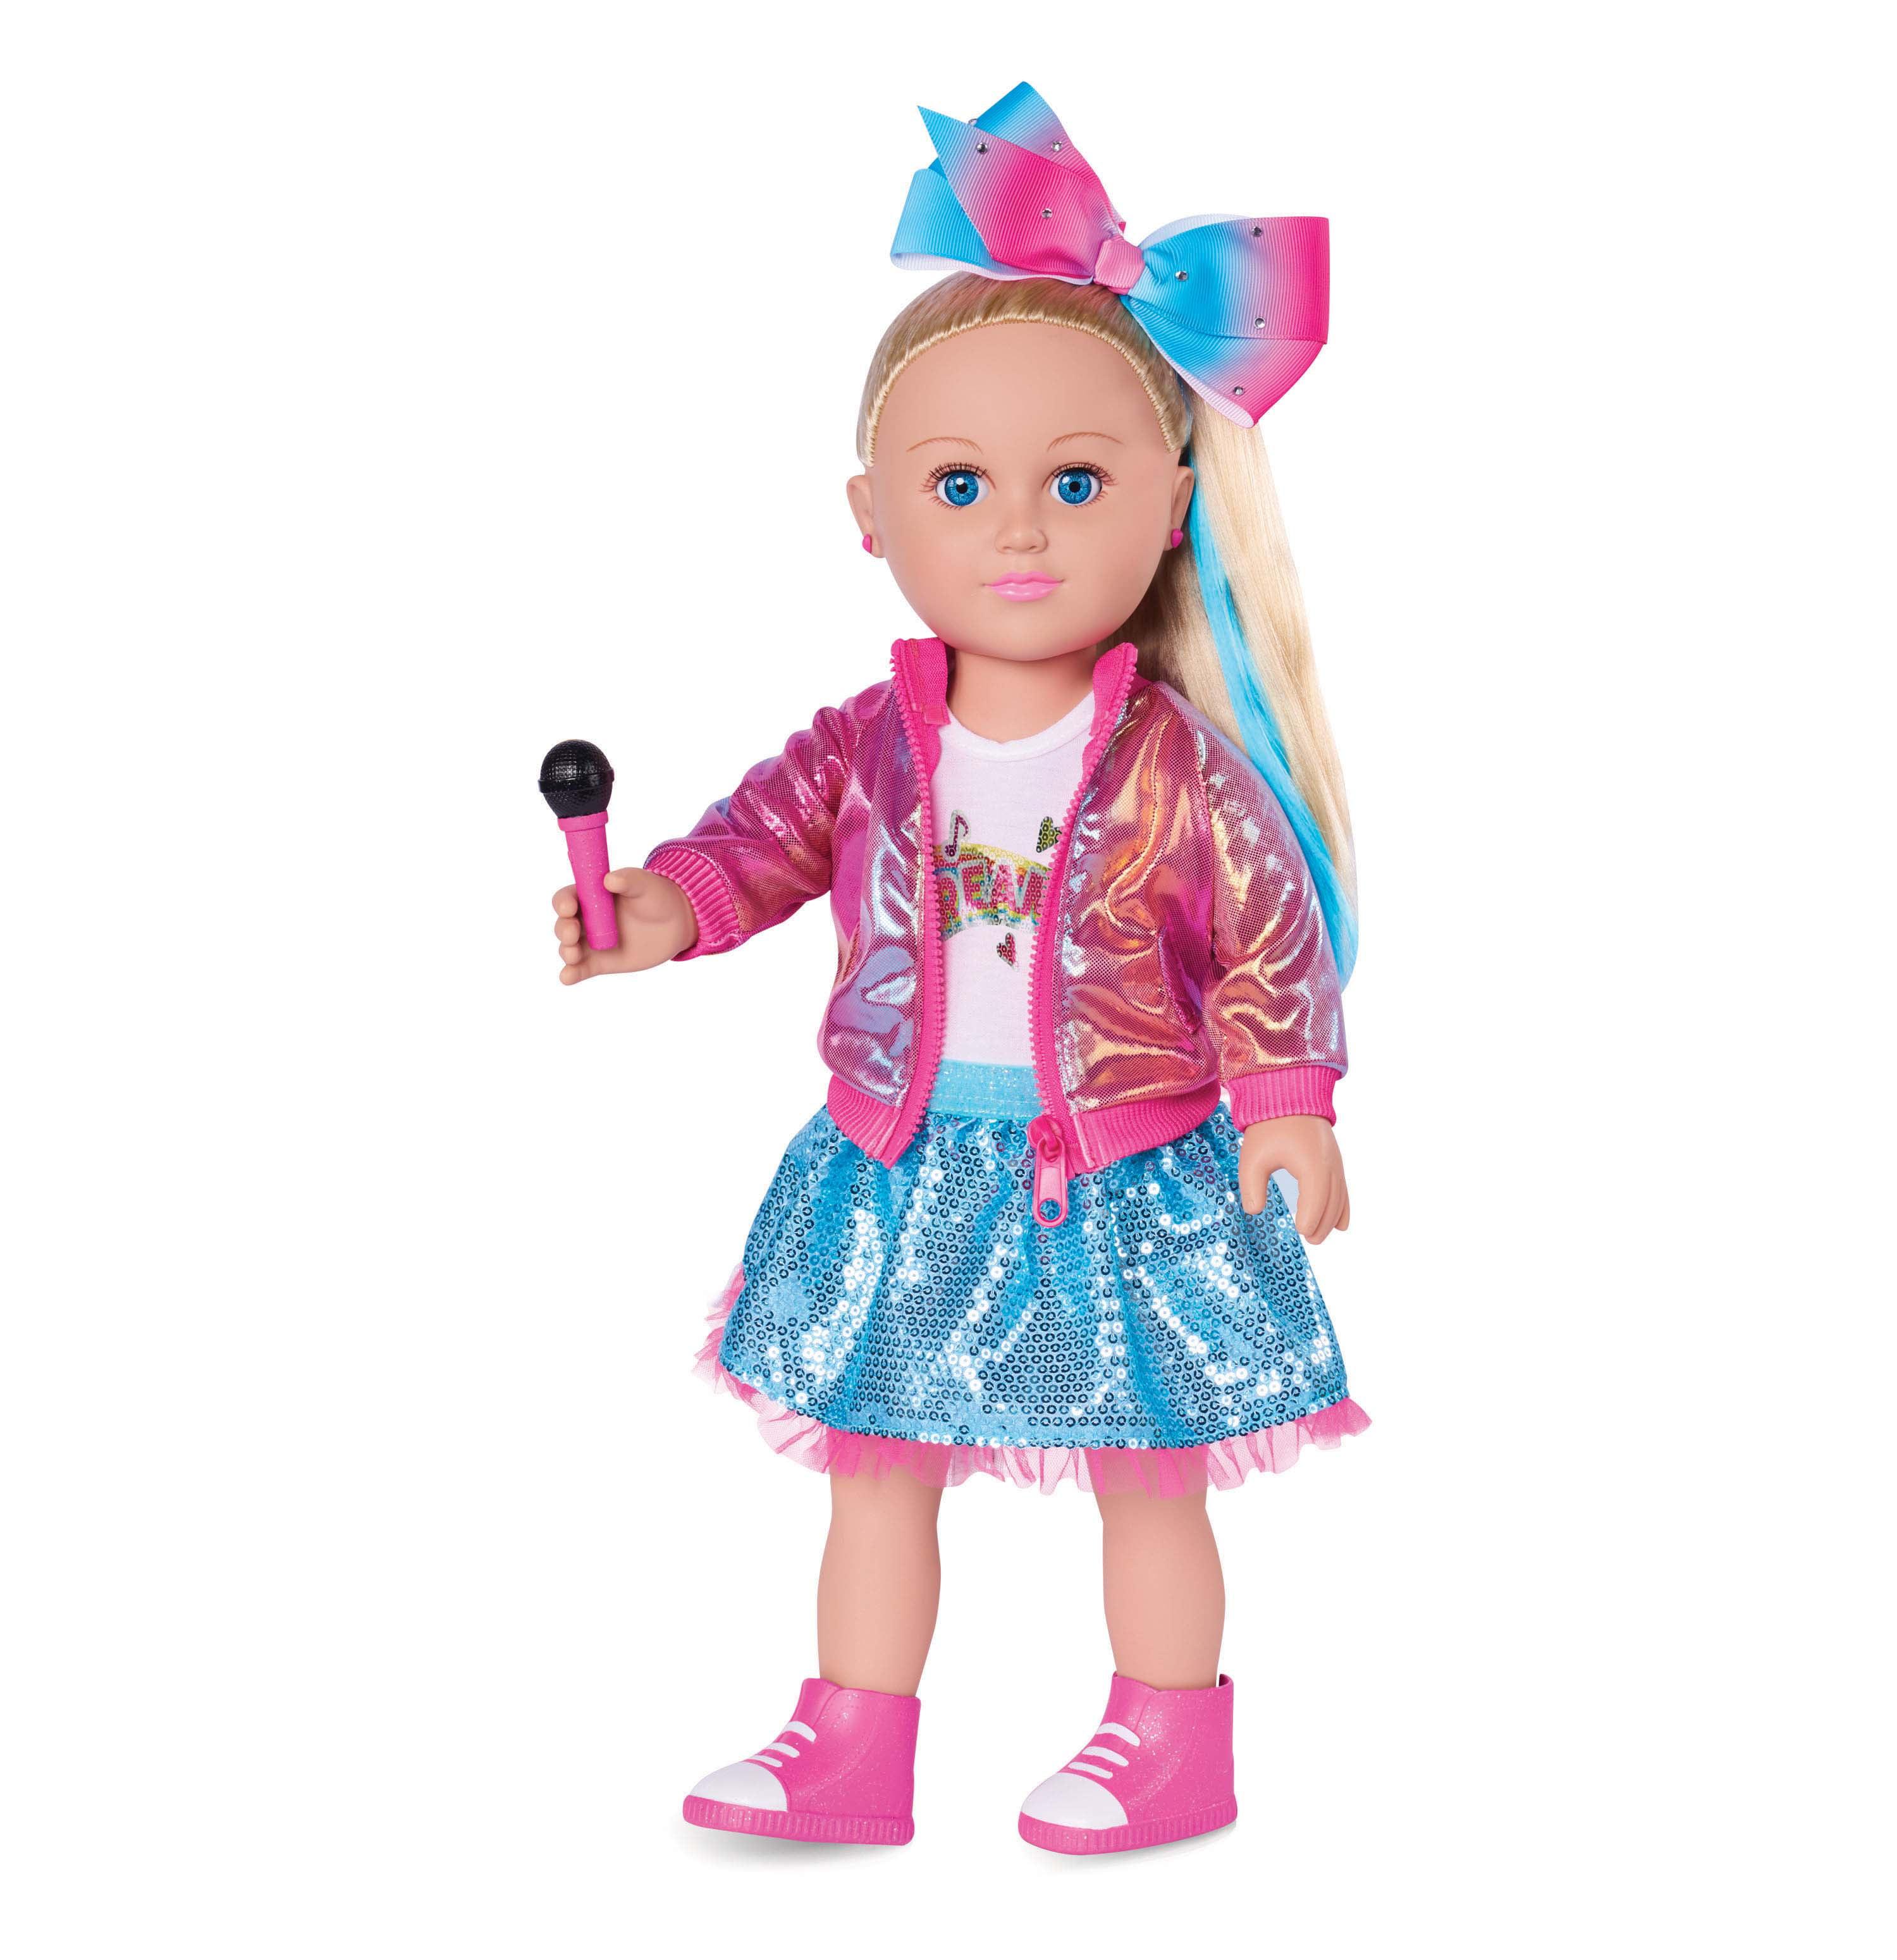 My Life As 18/'/' School Girl Doll Blonde Hair